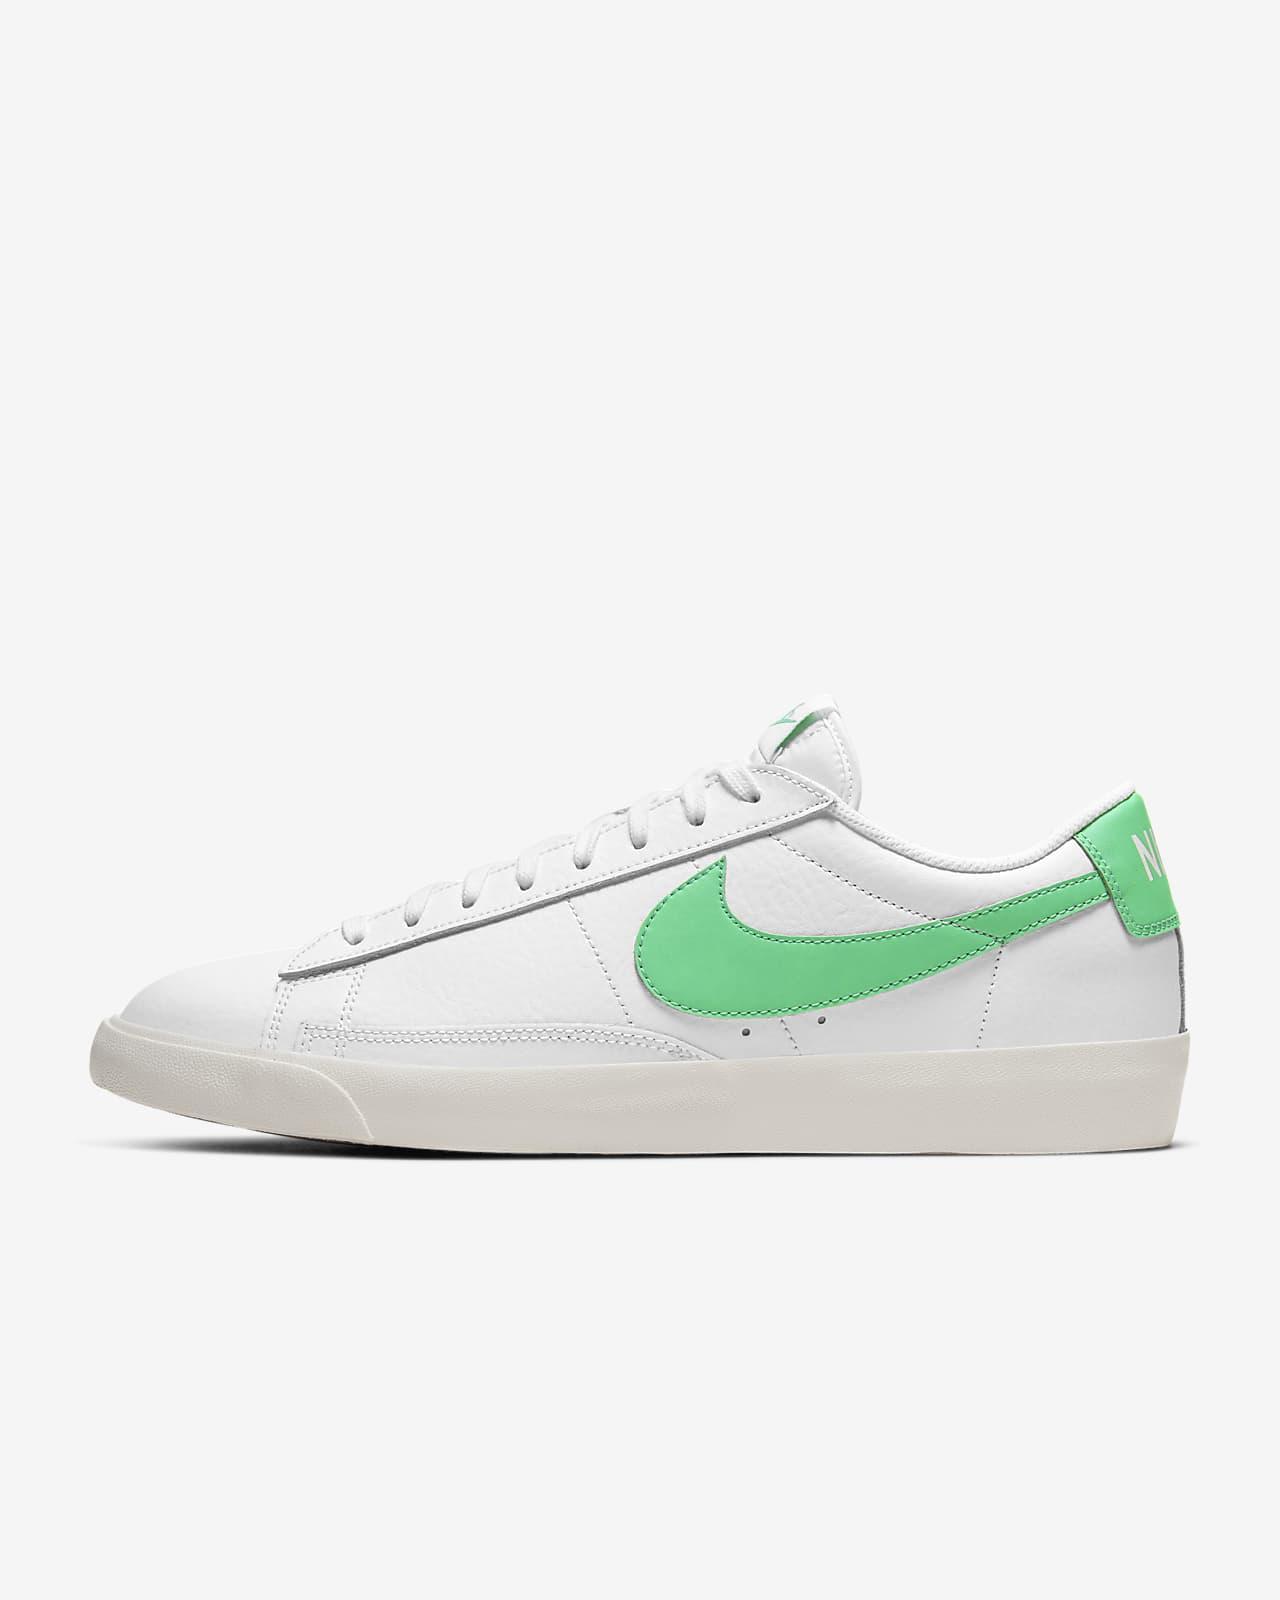 Nike Blazer Low Leather Men's Shoes